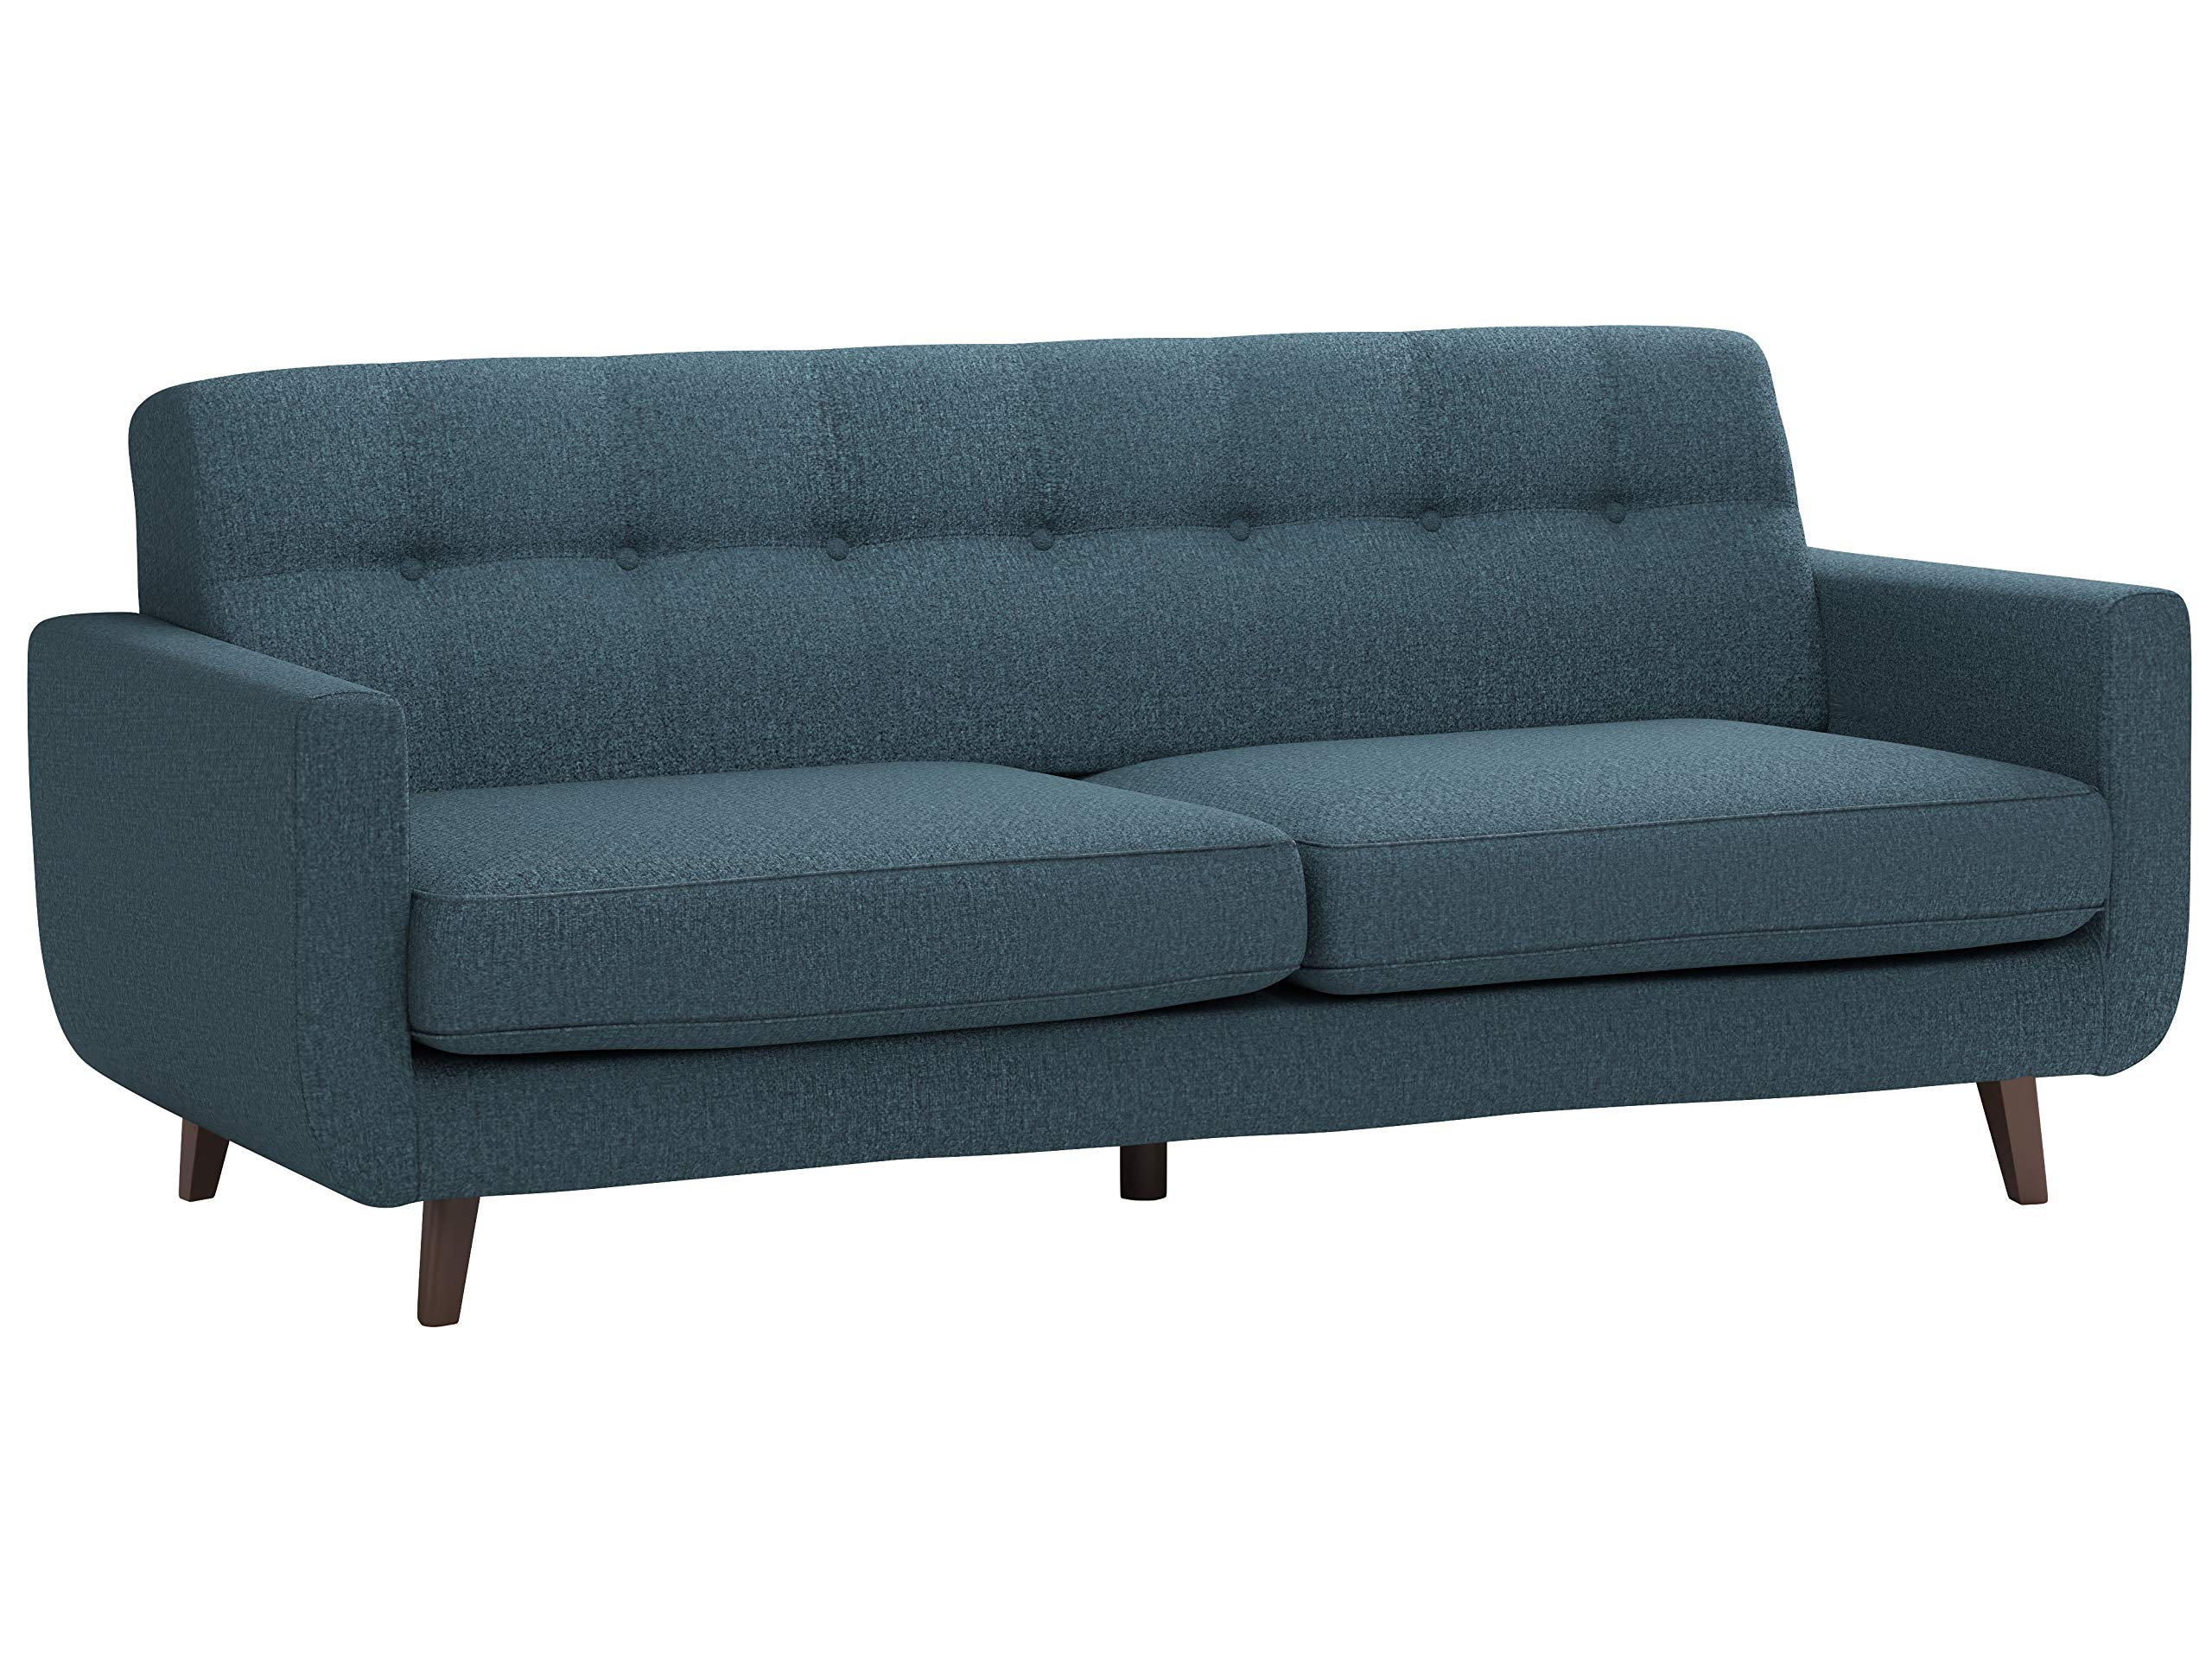 Rivet Sloane Mid-Century Modern Sofa with Tufted Back, 79.9''W, Denim by Rivet